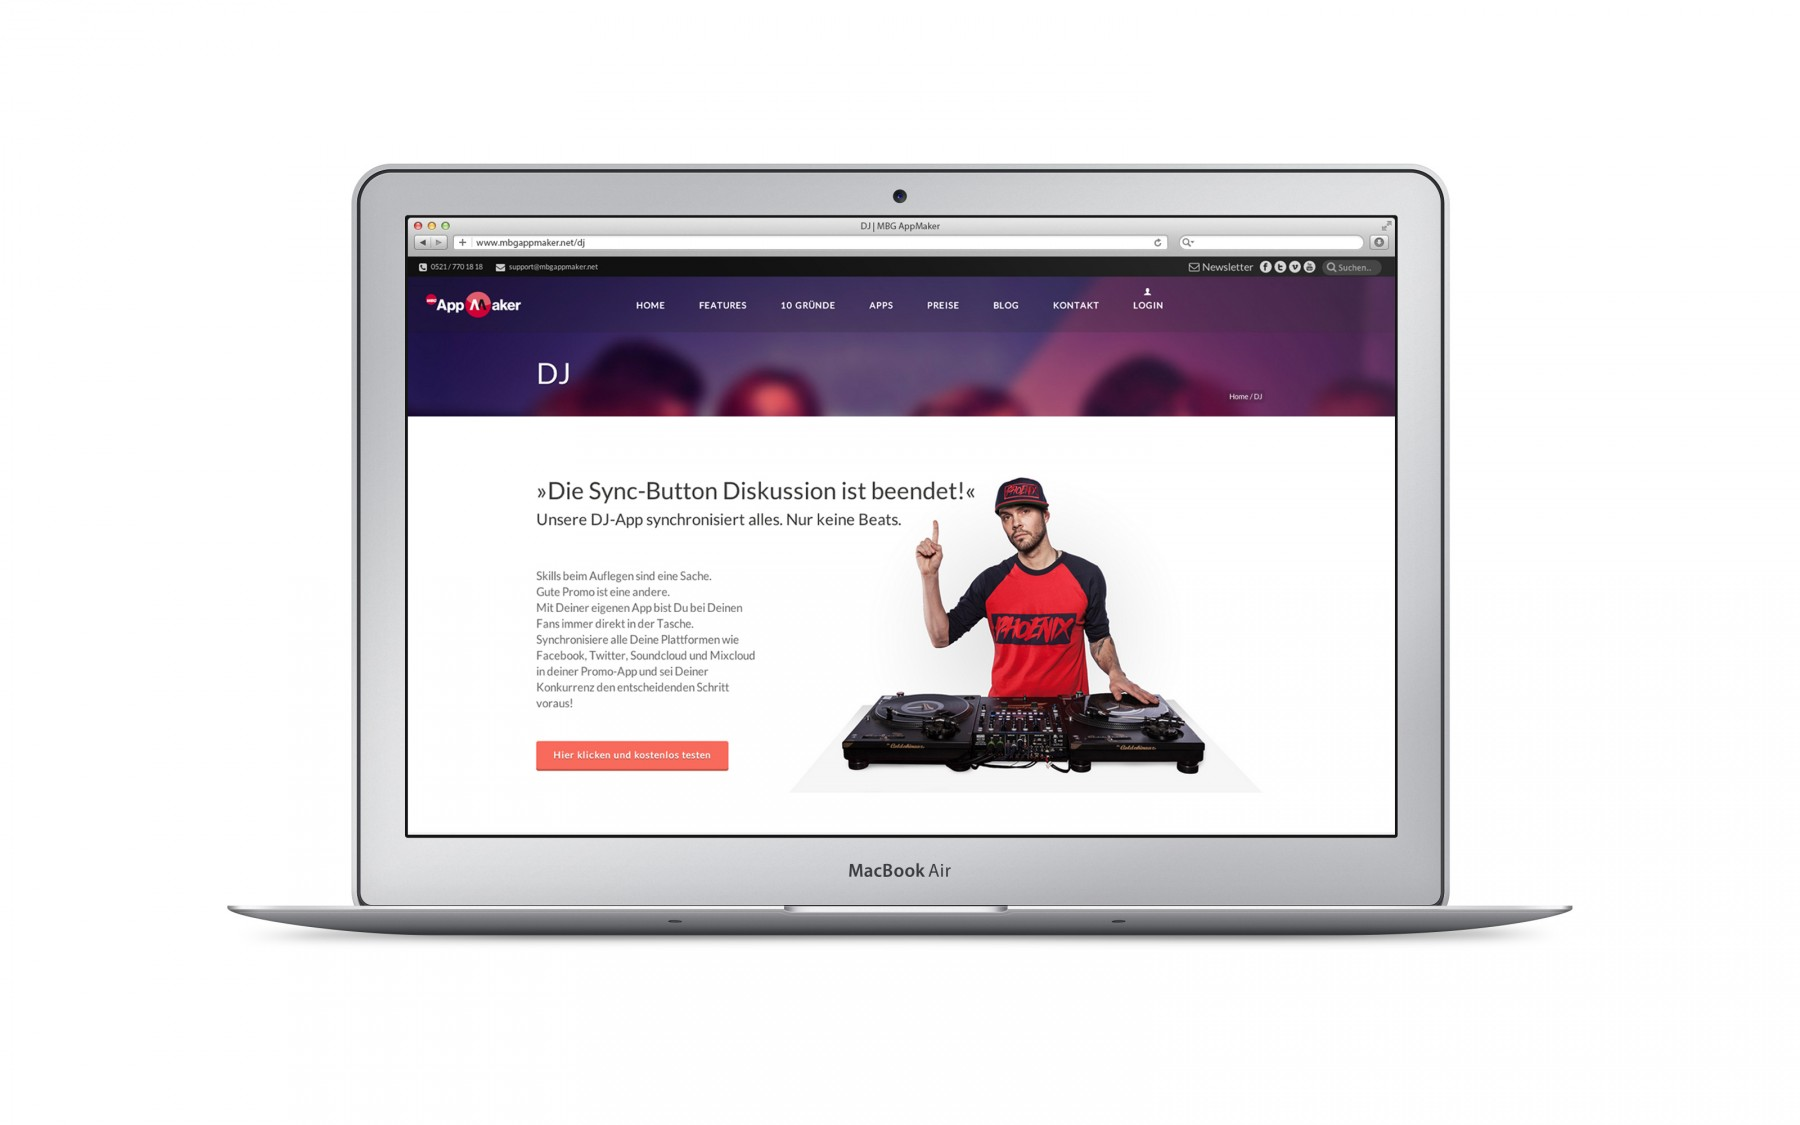 MBG-AppMaker-Content-Marketing